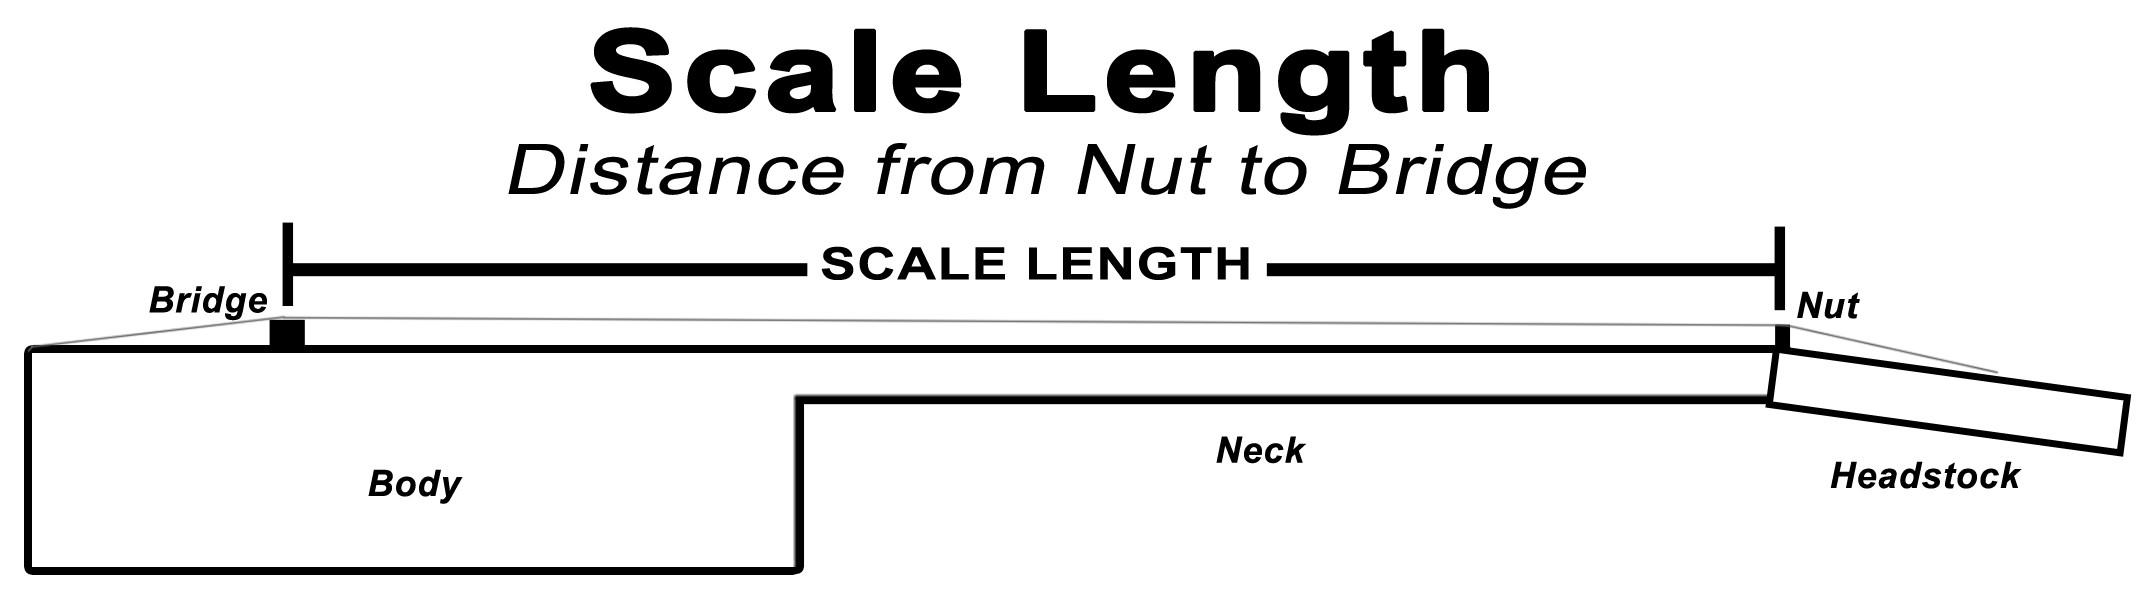 Scale Length